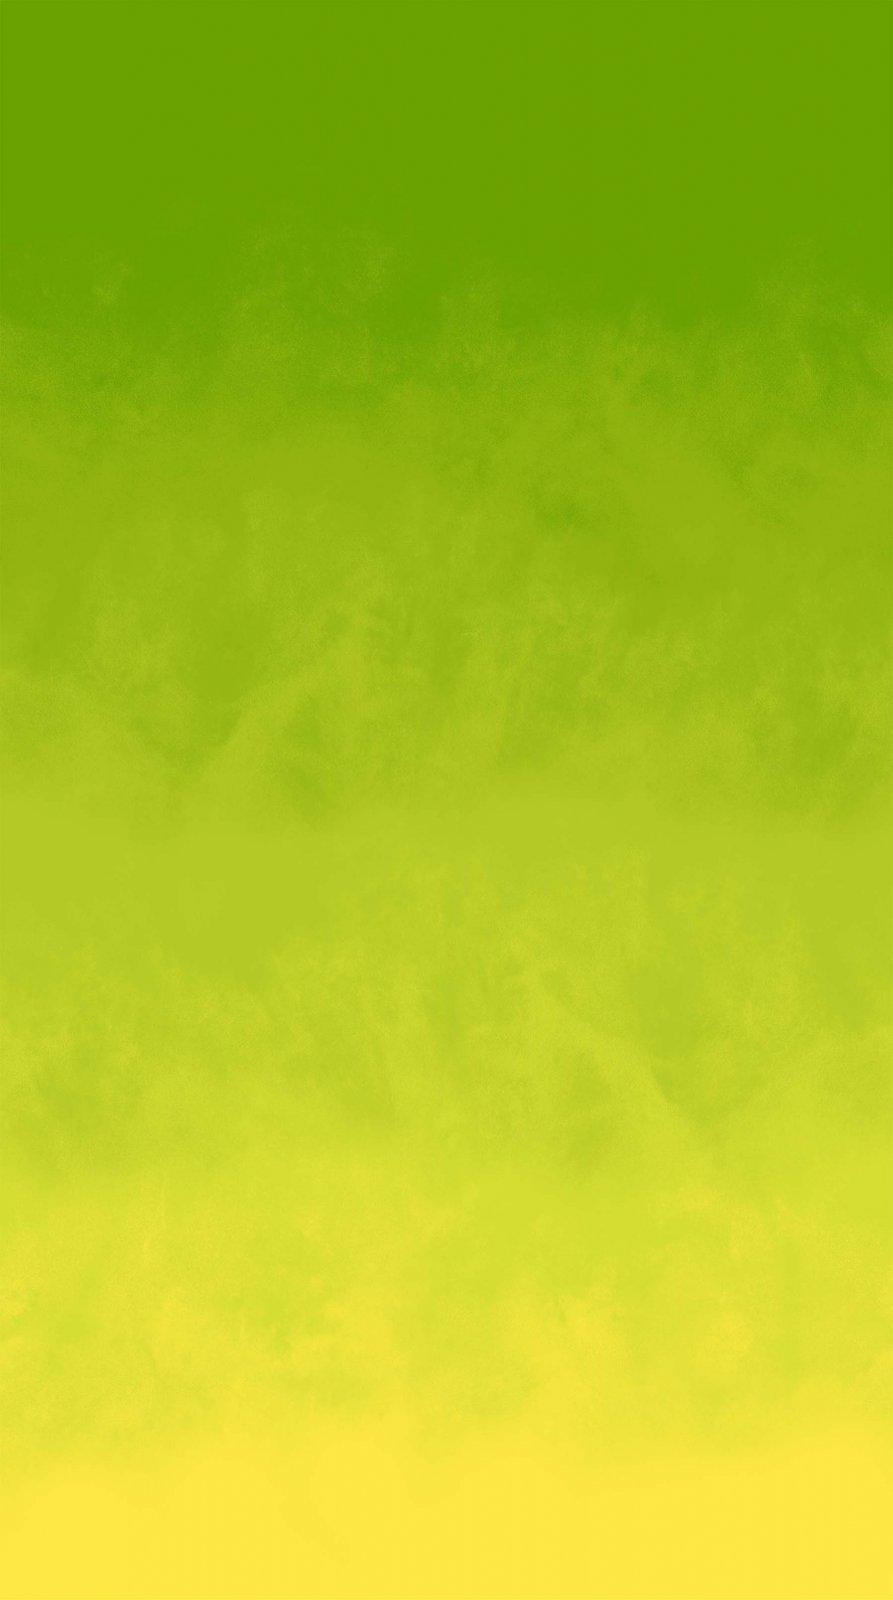 Rejoice - Green